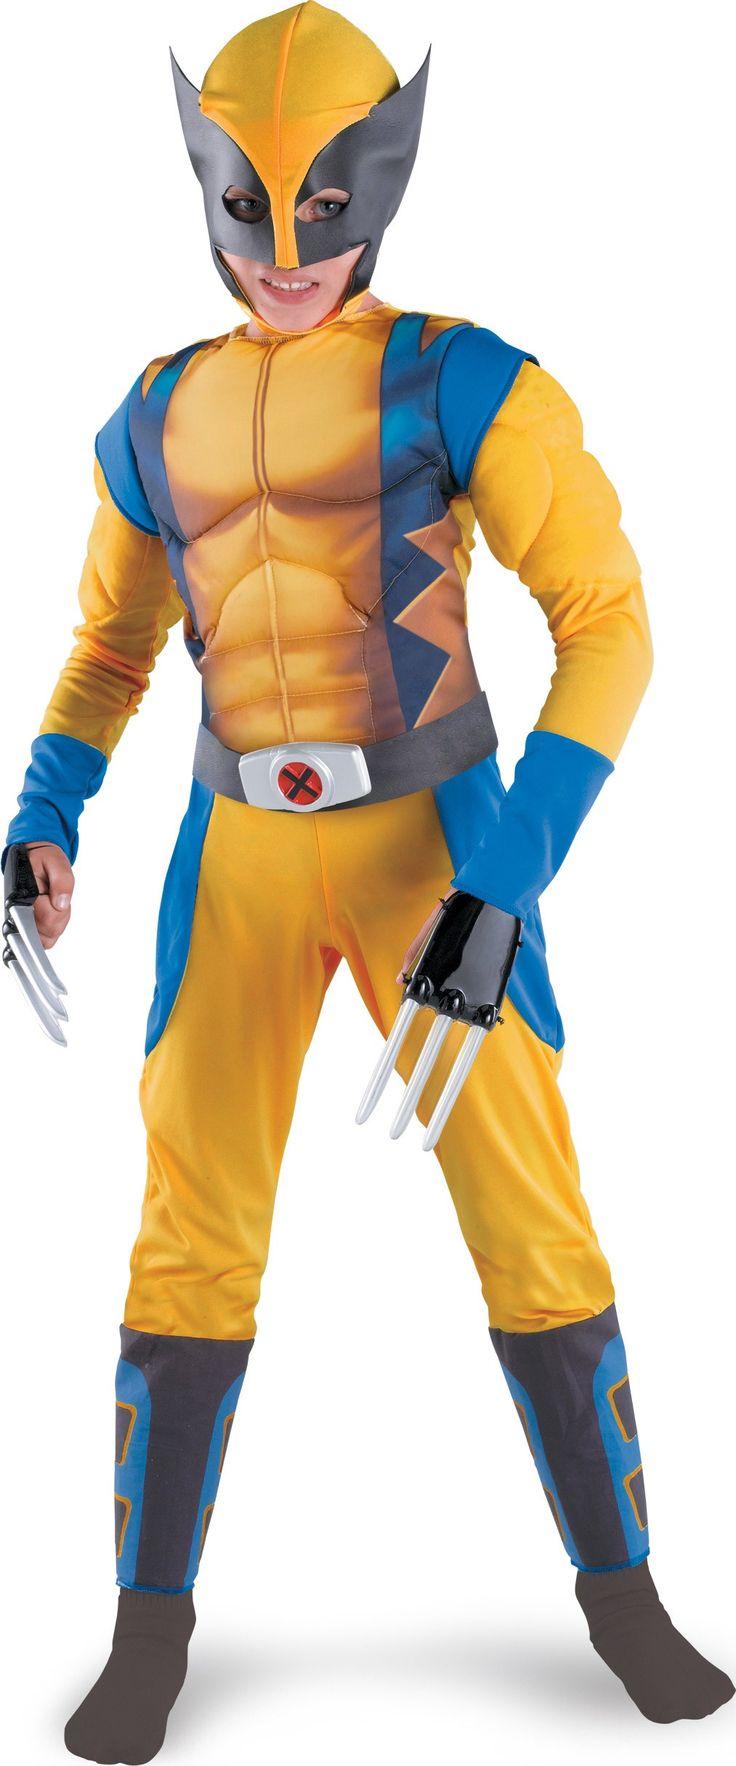 Wolverine Origins Classic Muscle Child Costume